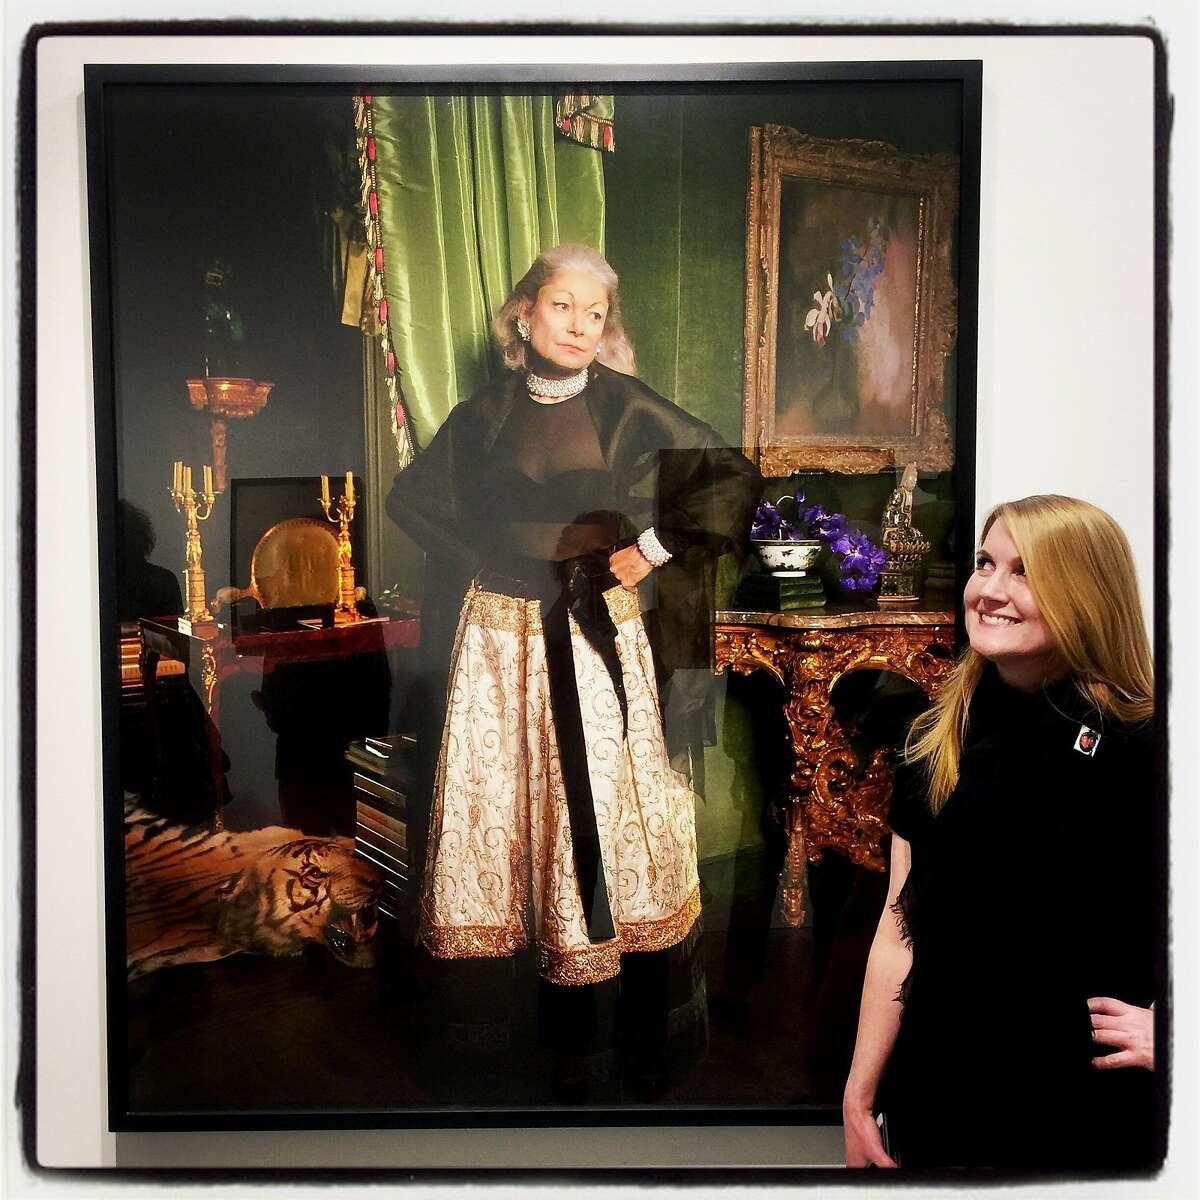 Gallerist Julie Casemore admires the Larry Sultan portrait of Denise Hale at Minnesota Street Project. April 13, 2017.